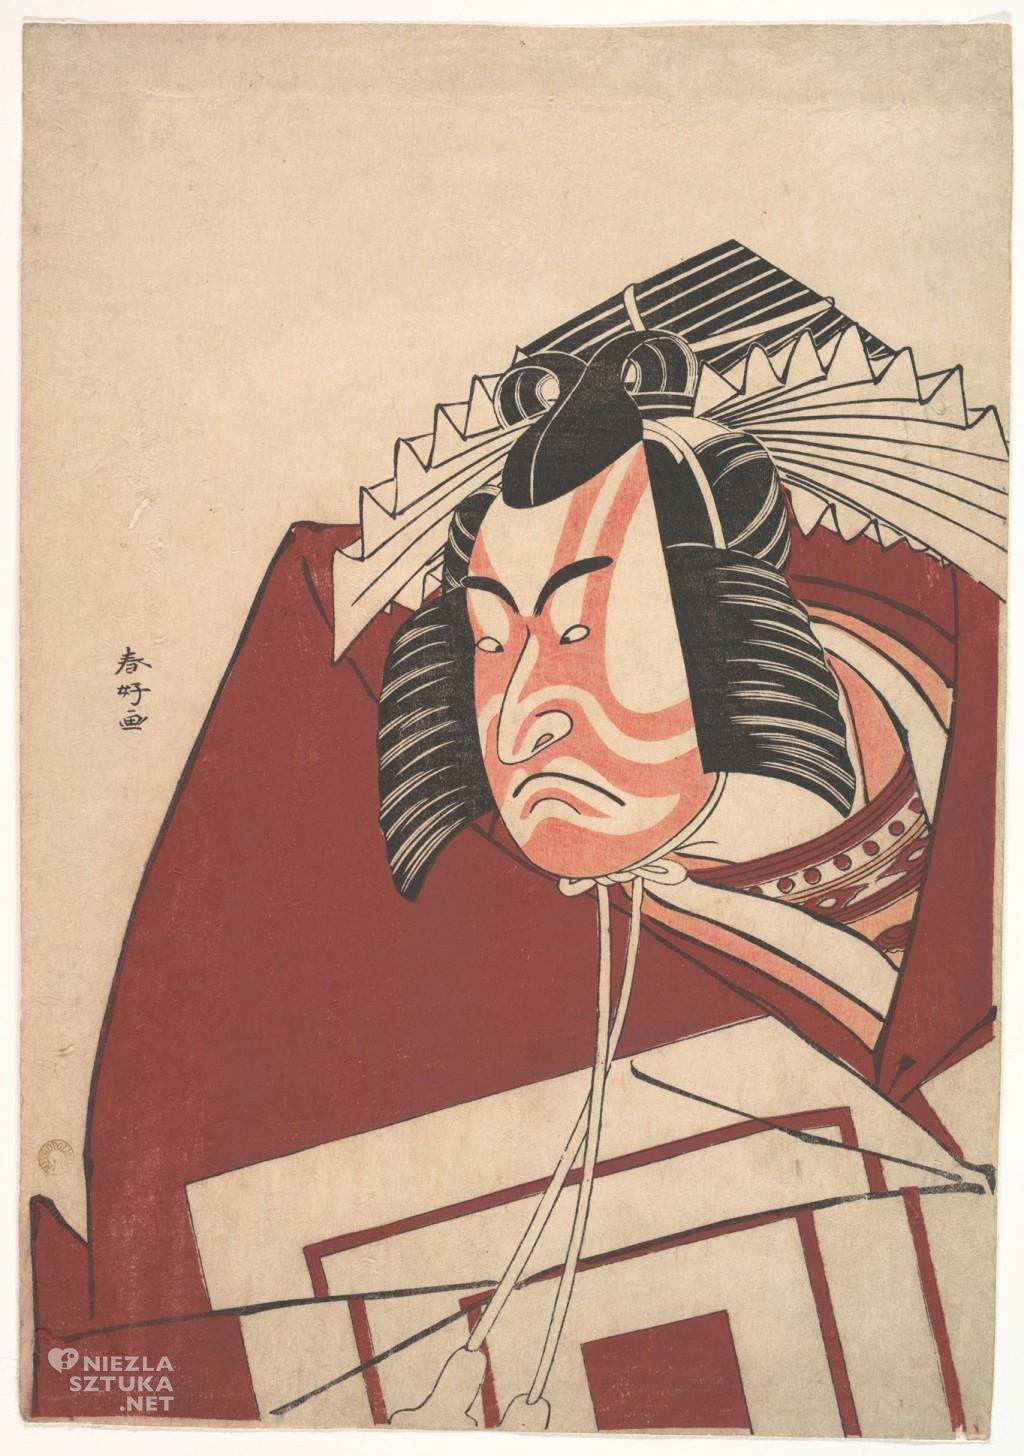 Katsukawa Shunko, Ichikawa Danjuro V w przedstawieniu Shibaraku, ok. 1789, źródło: Metropolitan Museum Of Art